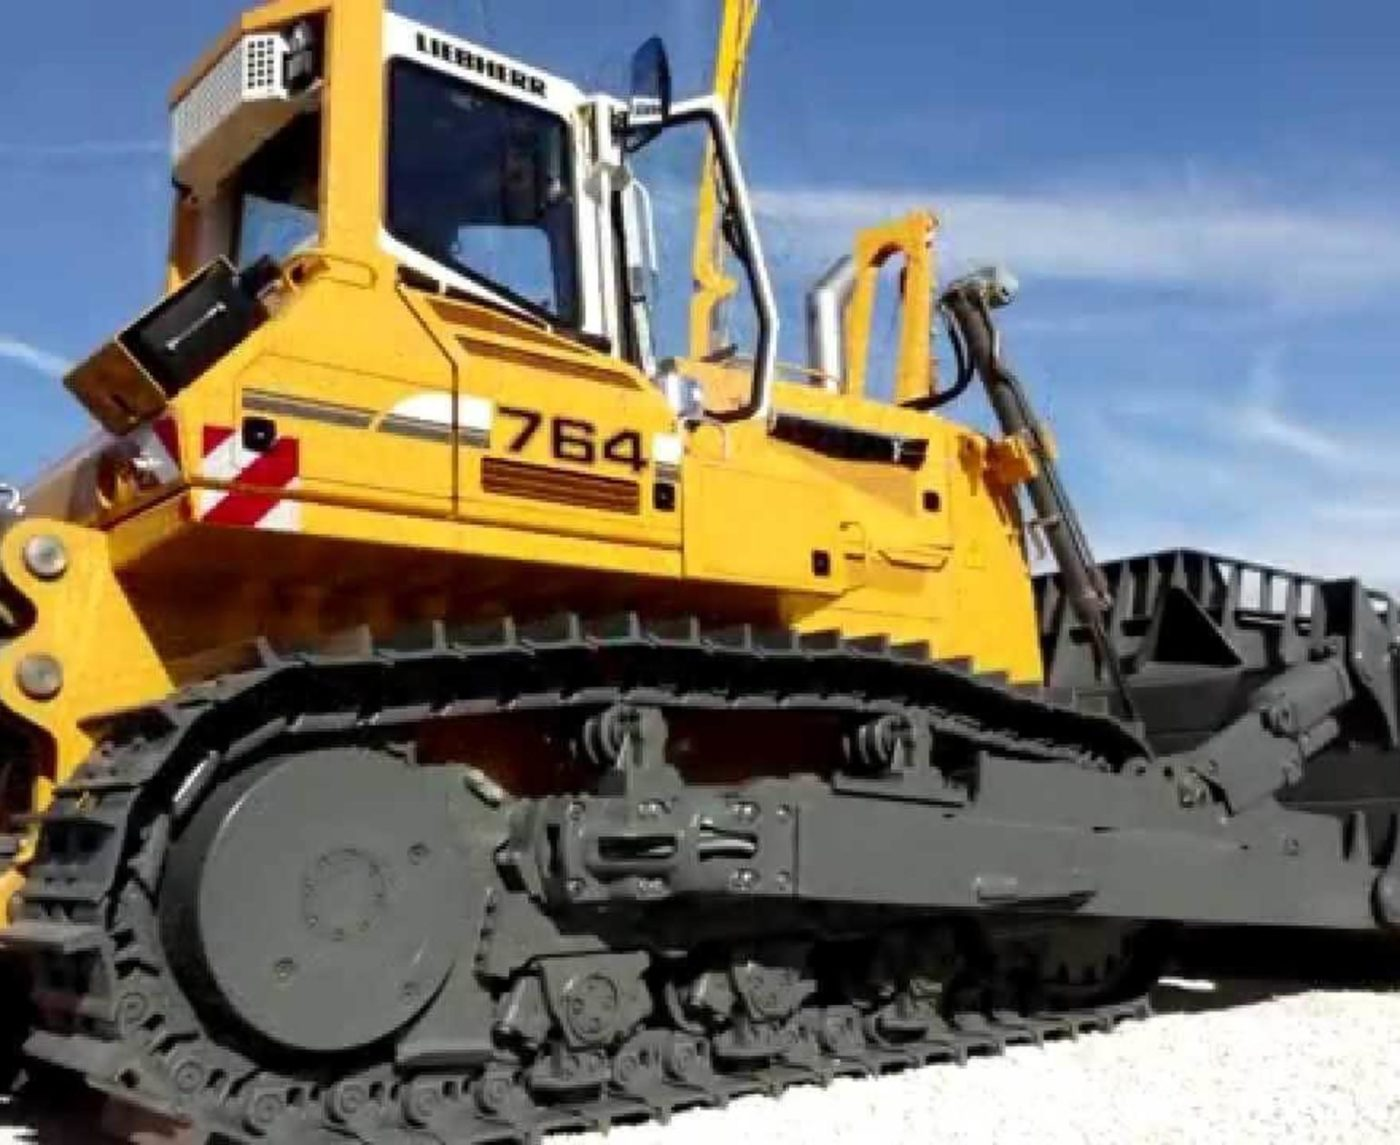 Бульдозер Liebherr PR 764 L технические характеристики